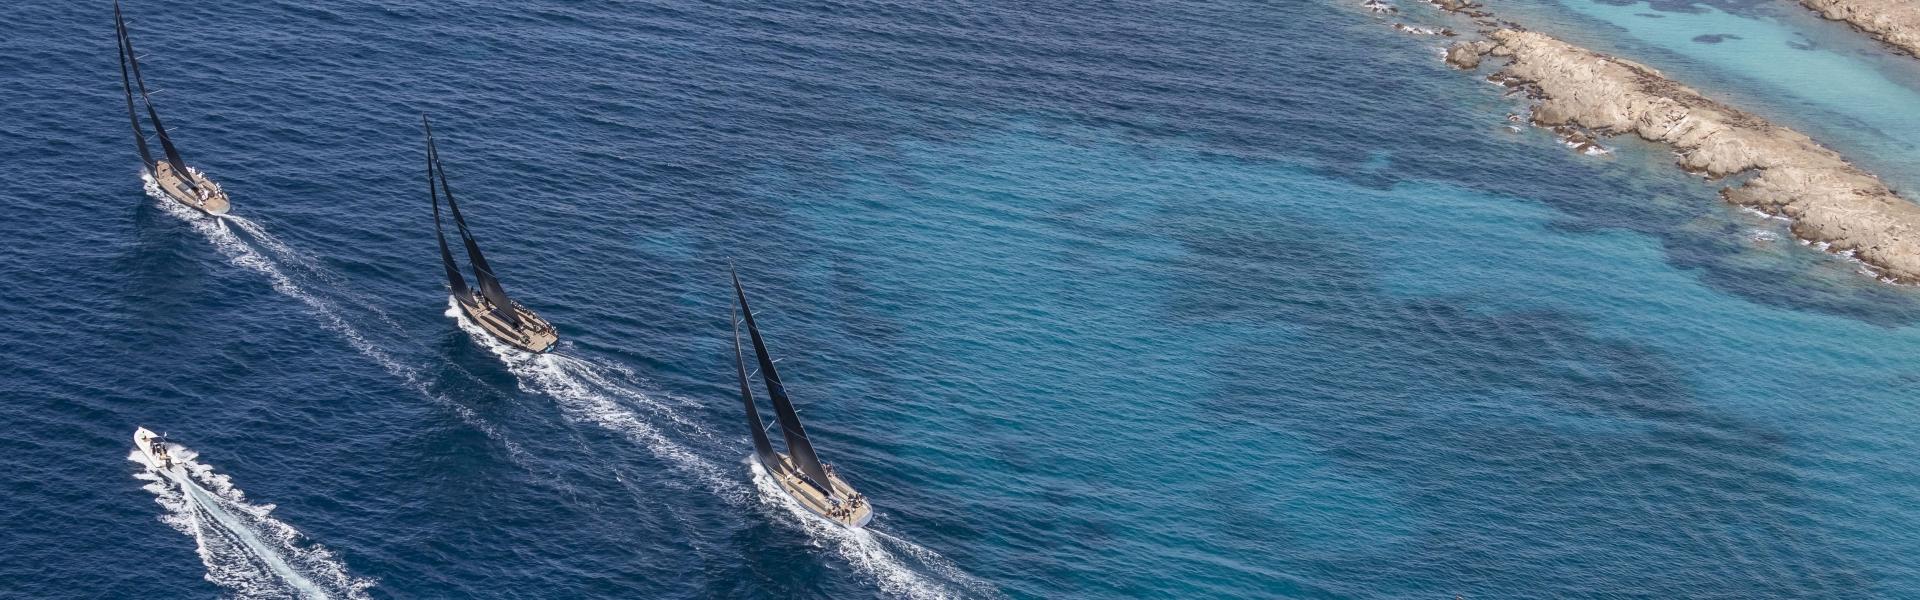 Maxi Yacht Rolex Cup & Rolex Maxi 72 World Championship - Porto Cervo 2018